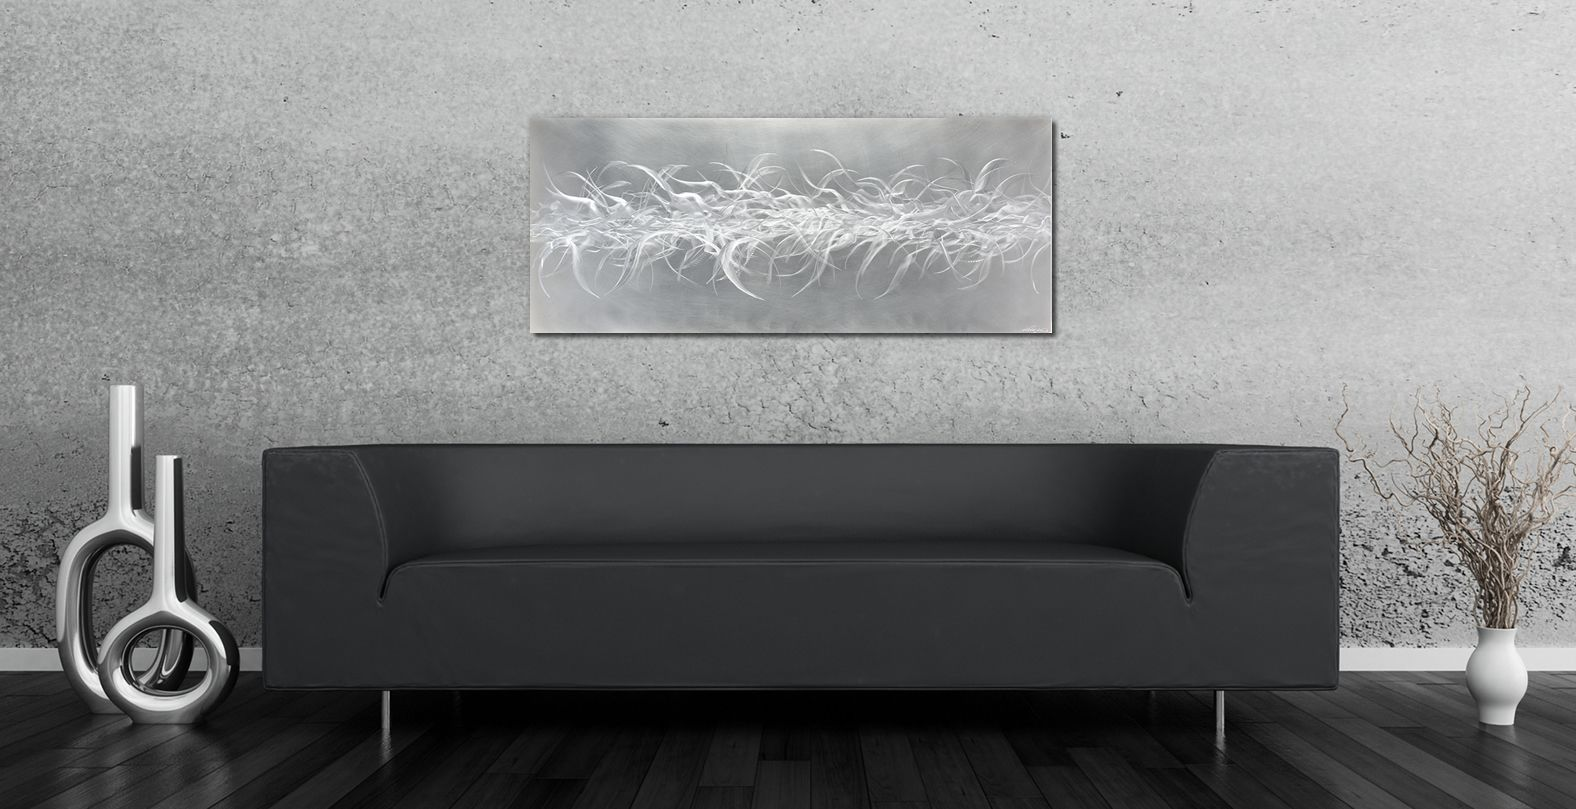 NY0537M - Metal Art by Nicholas Yust, Alternate Angle 2